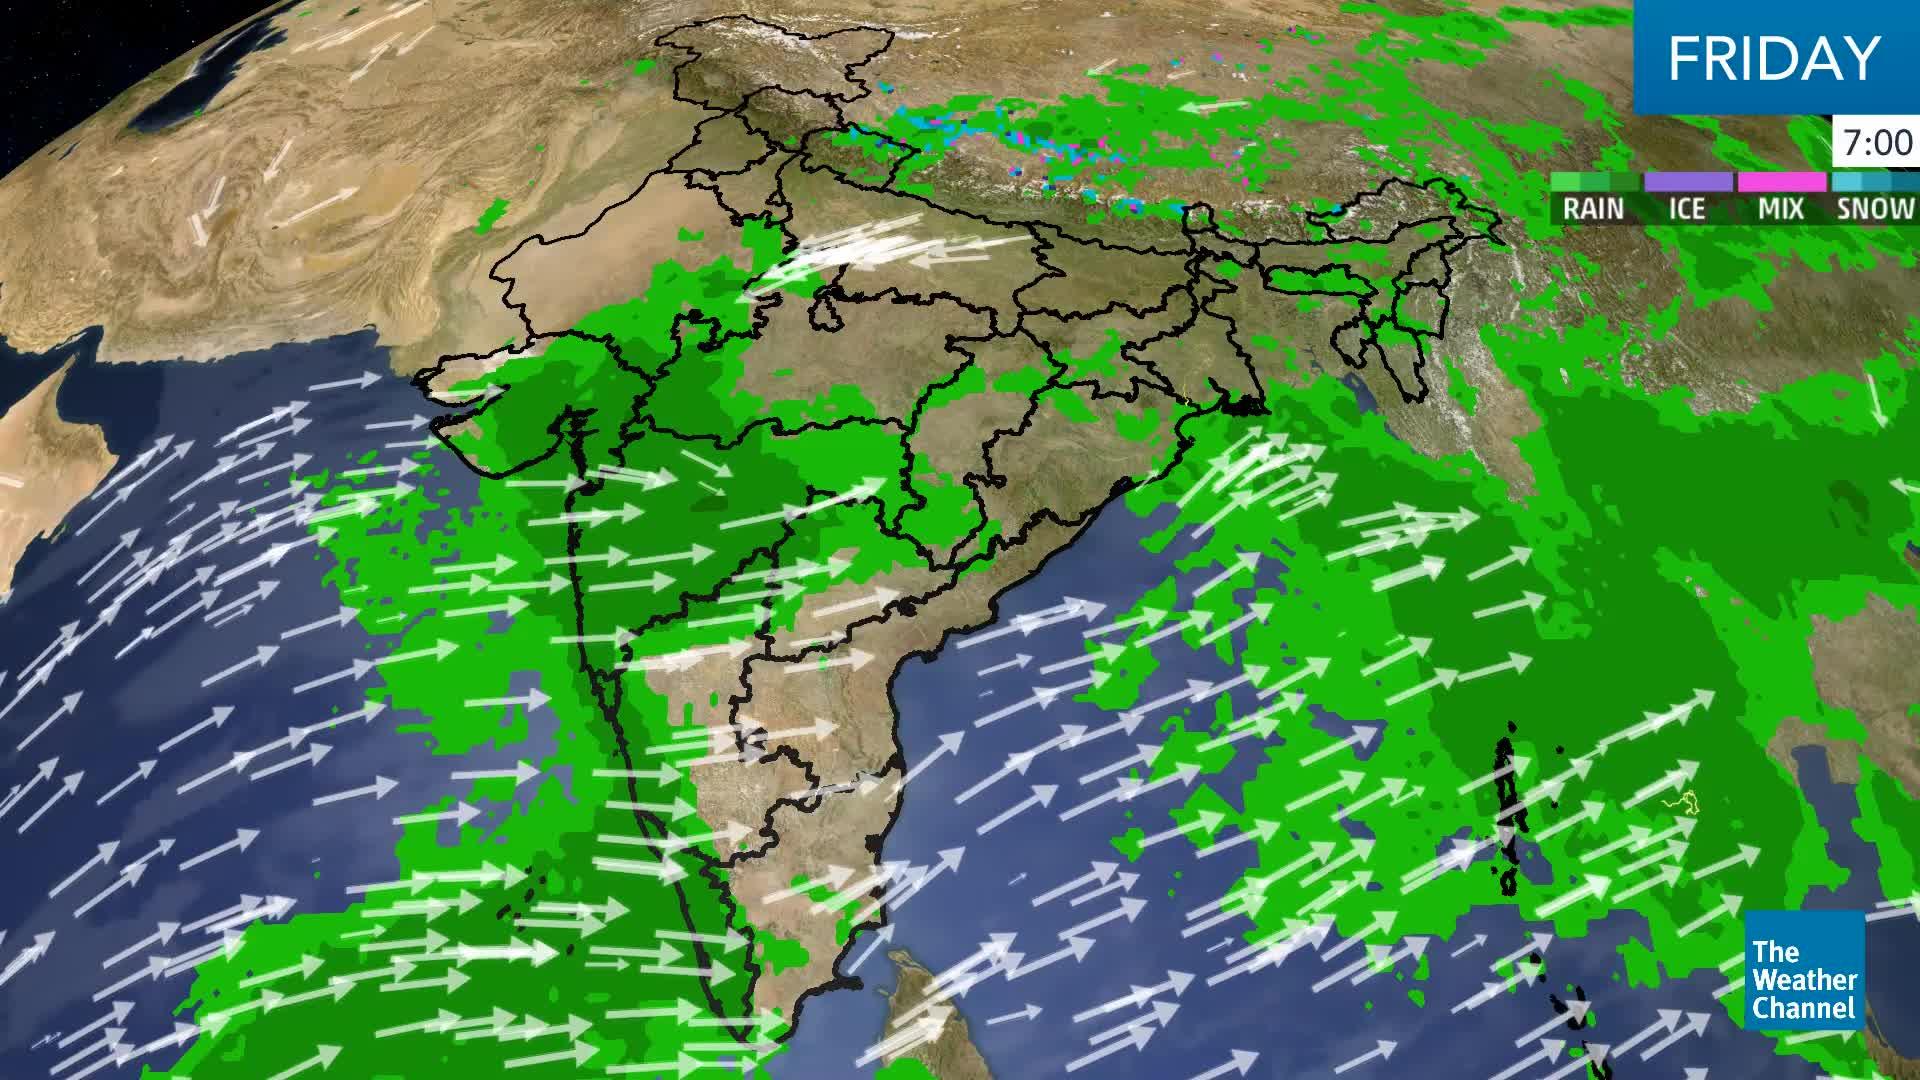 West-Moving Depression Spells Heavy Rain, Floods in Gujarat, Maharashtra